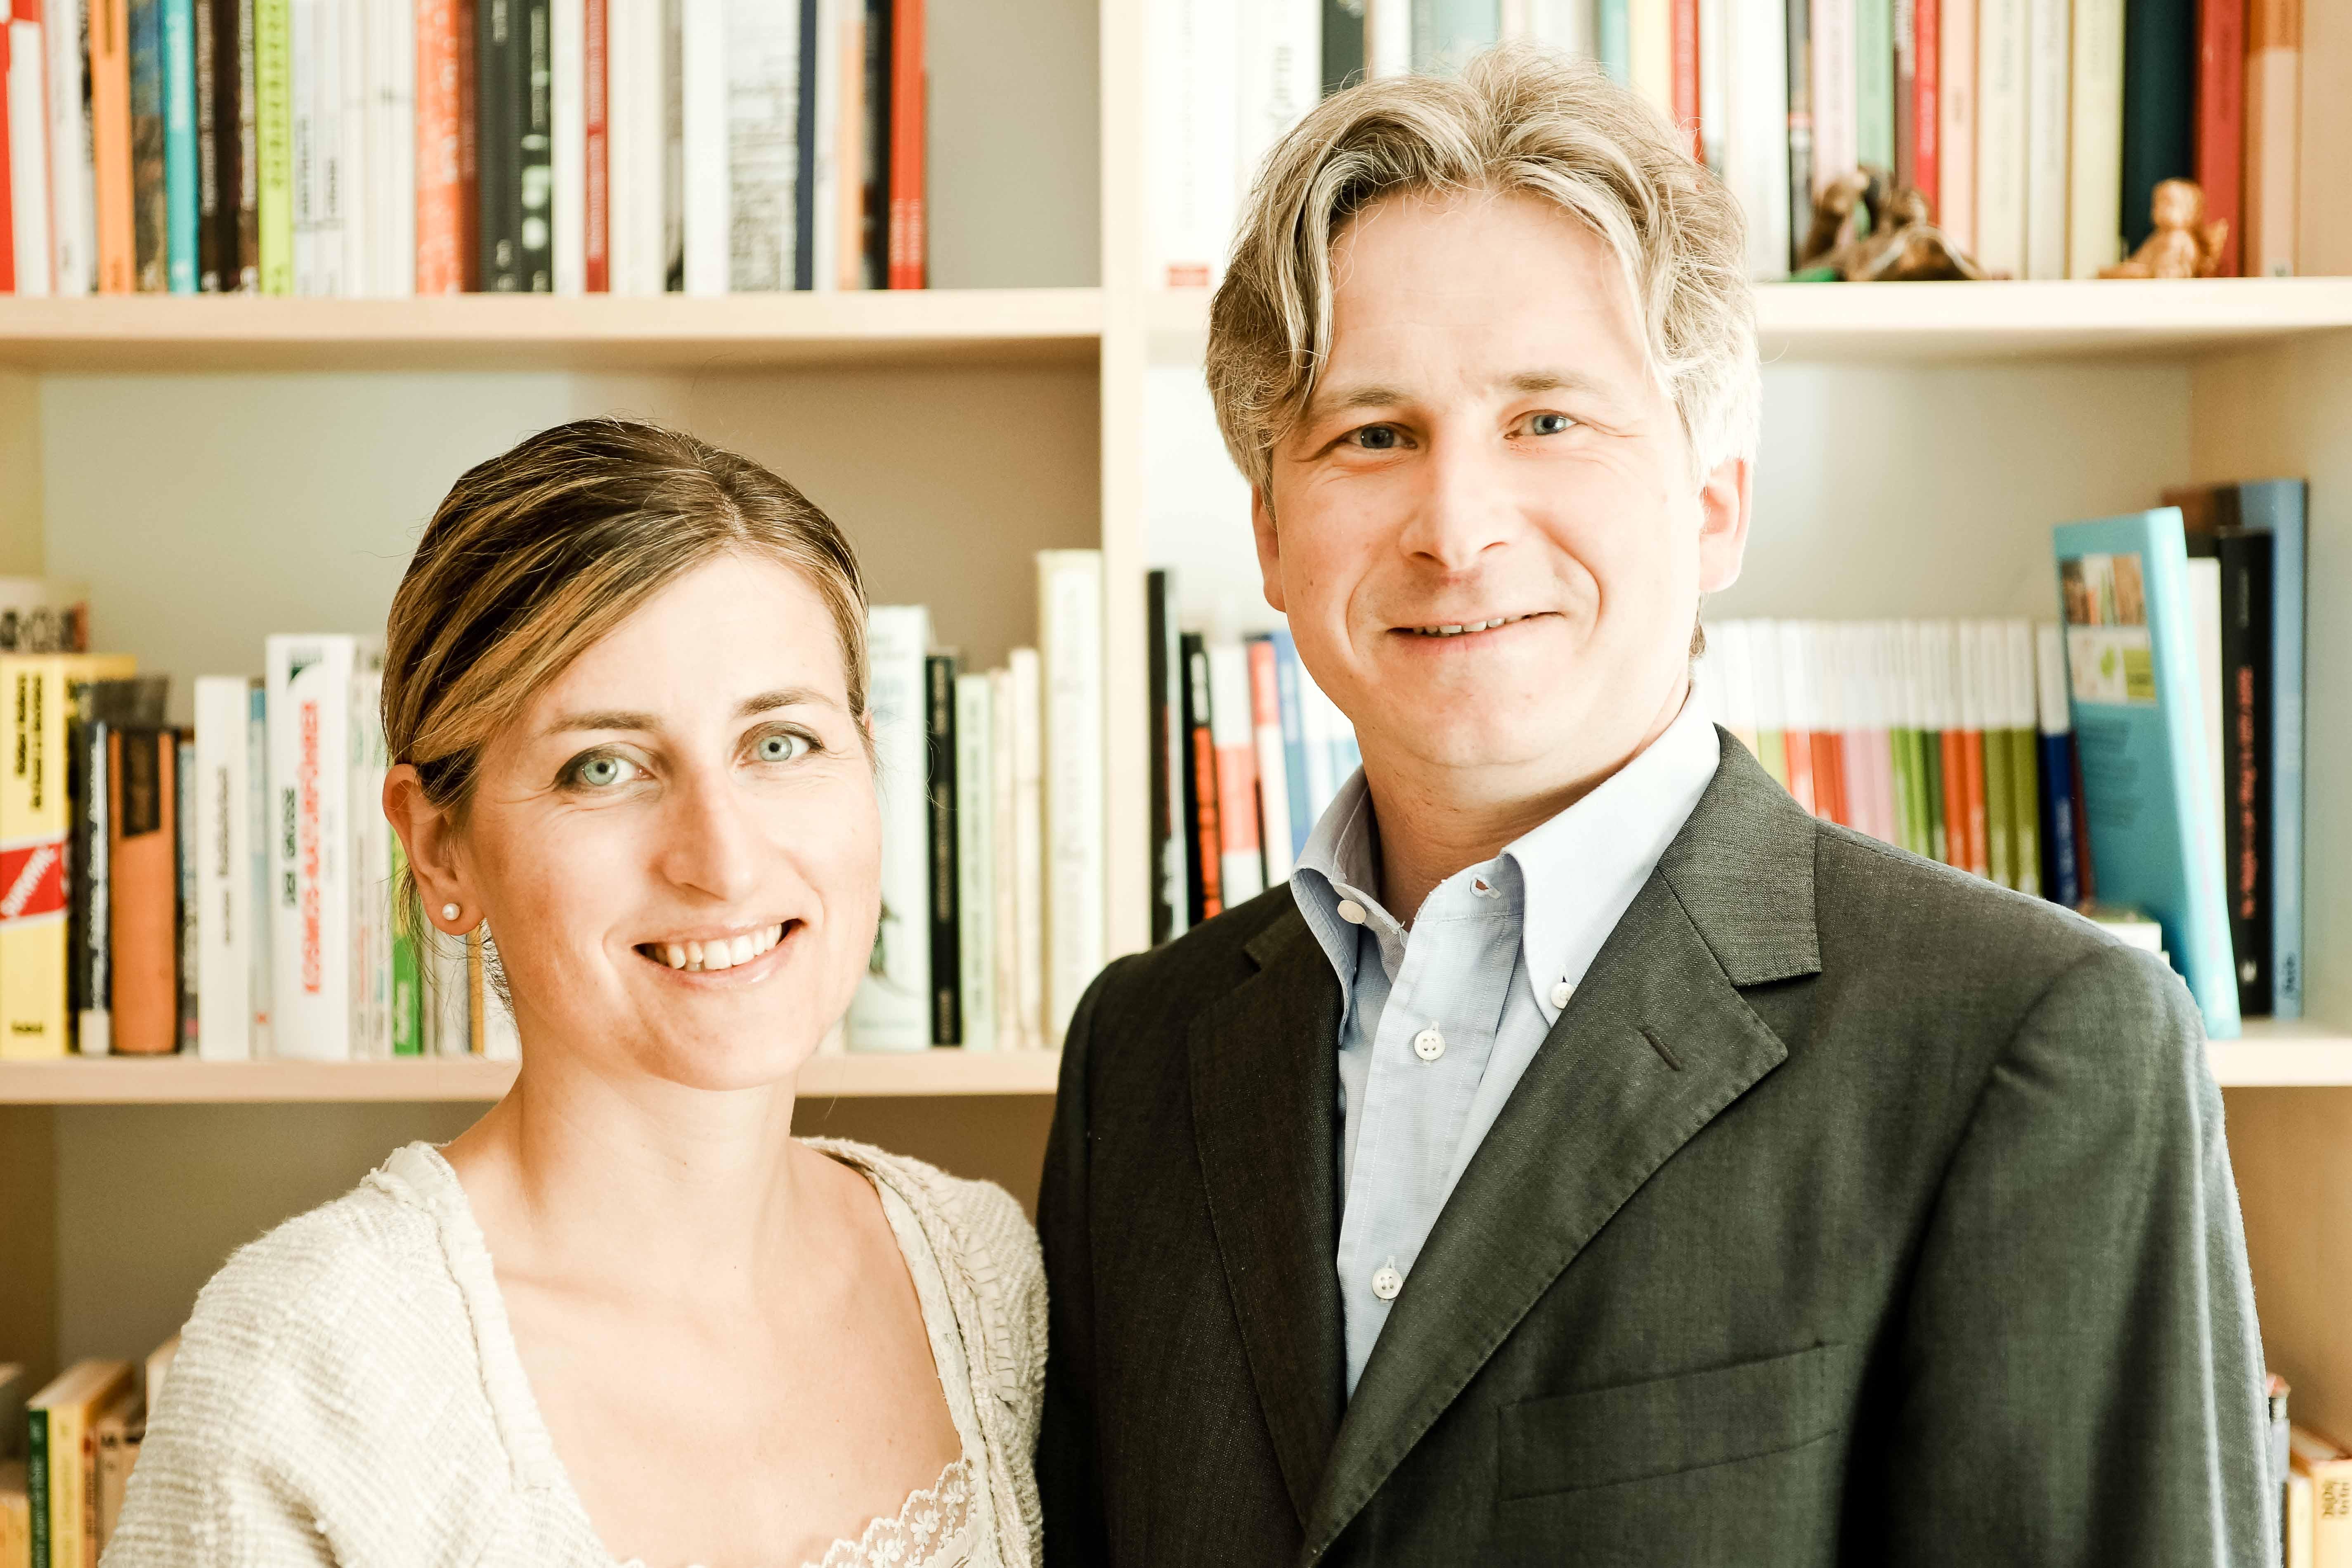 Elena Righi e Stefan Krickl di Larixpress